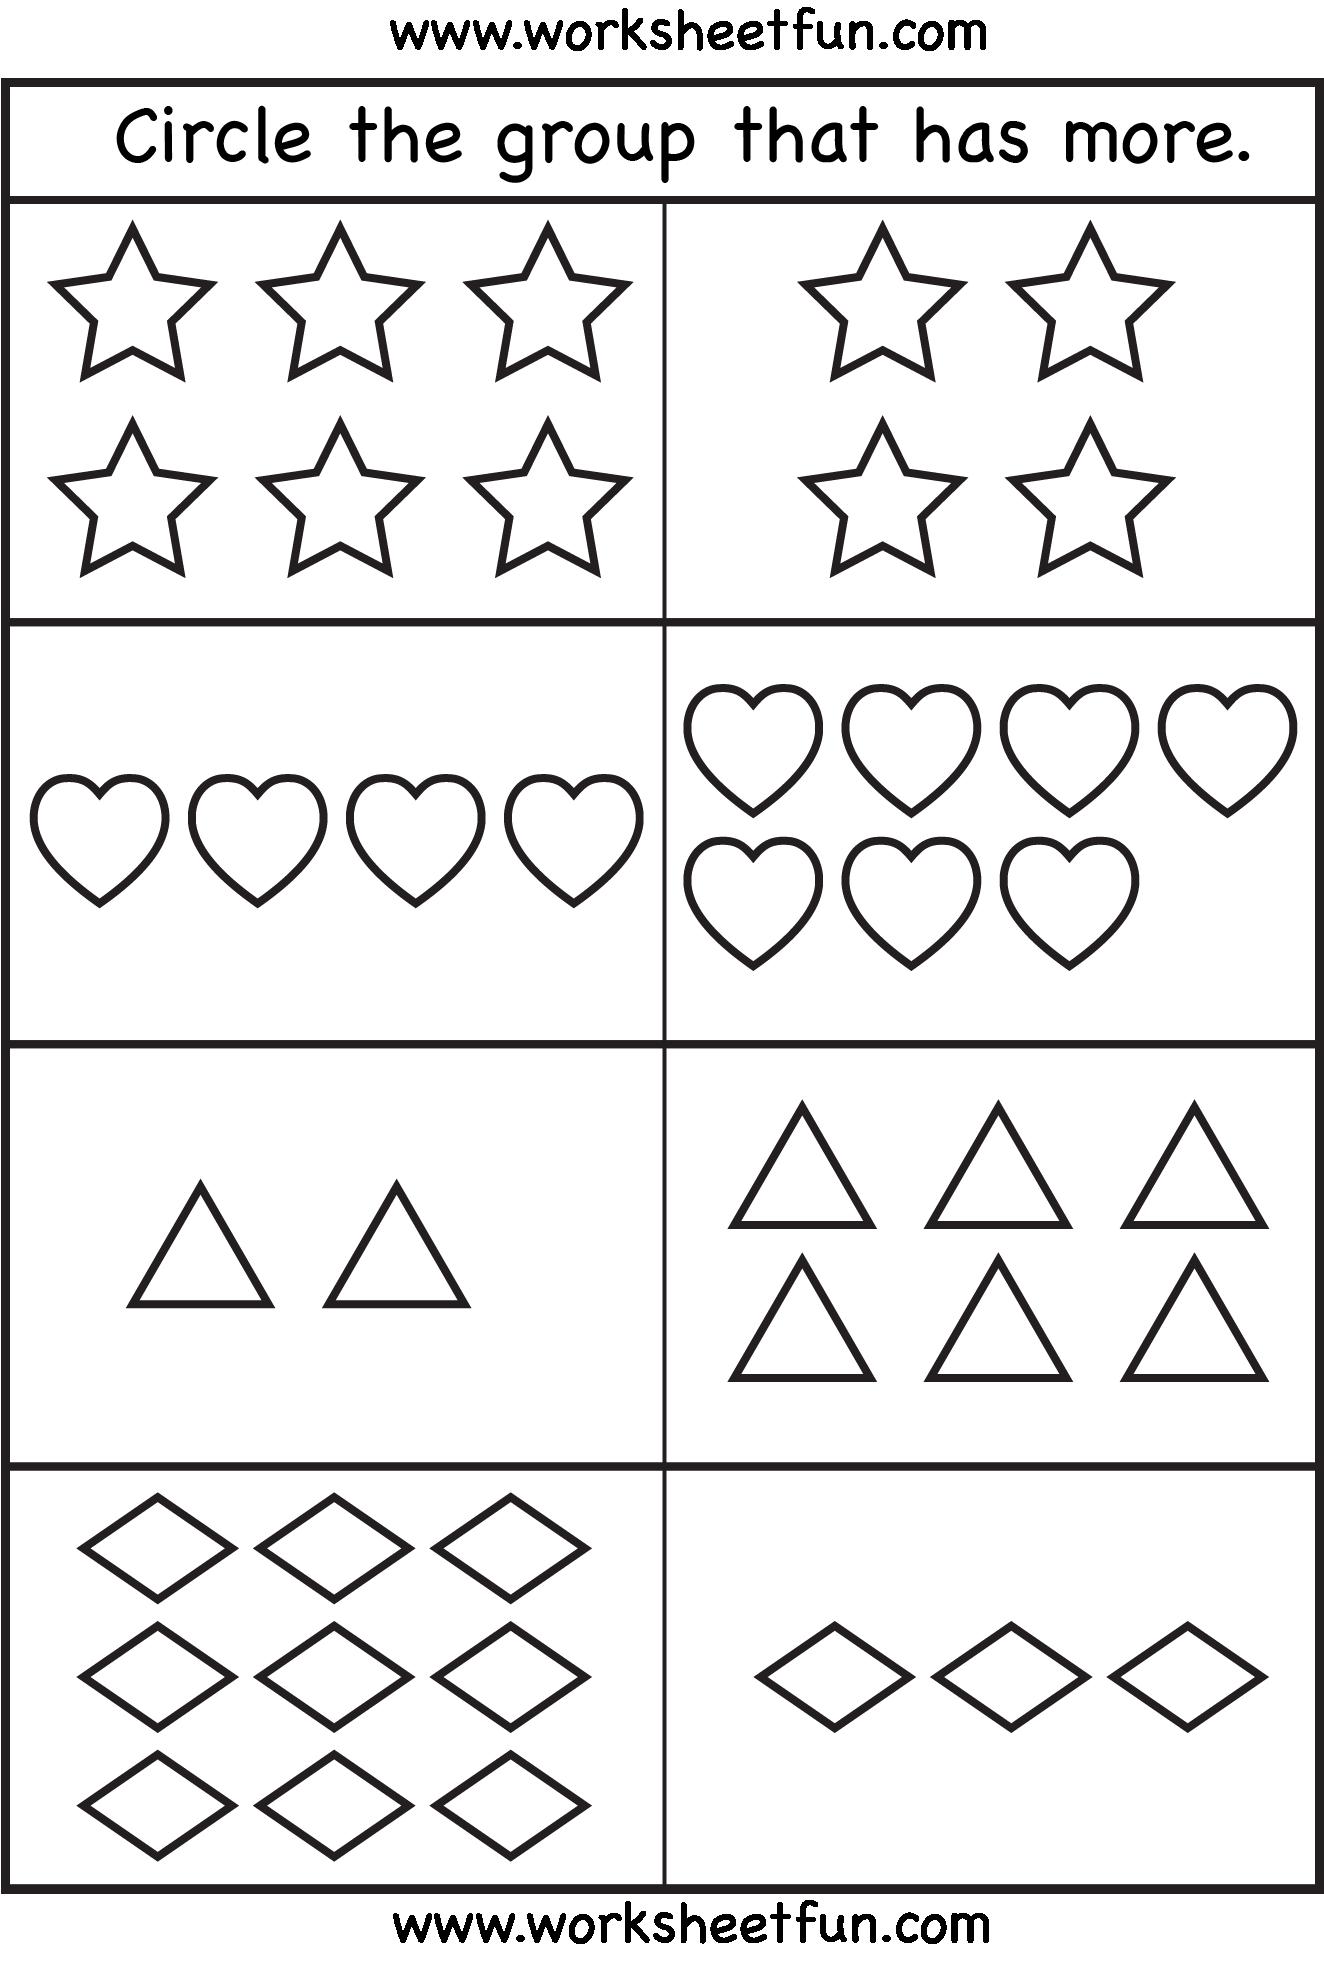 More And Fewer Worksheets For Kindergarten The Best Worksheets